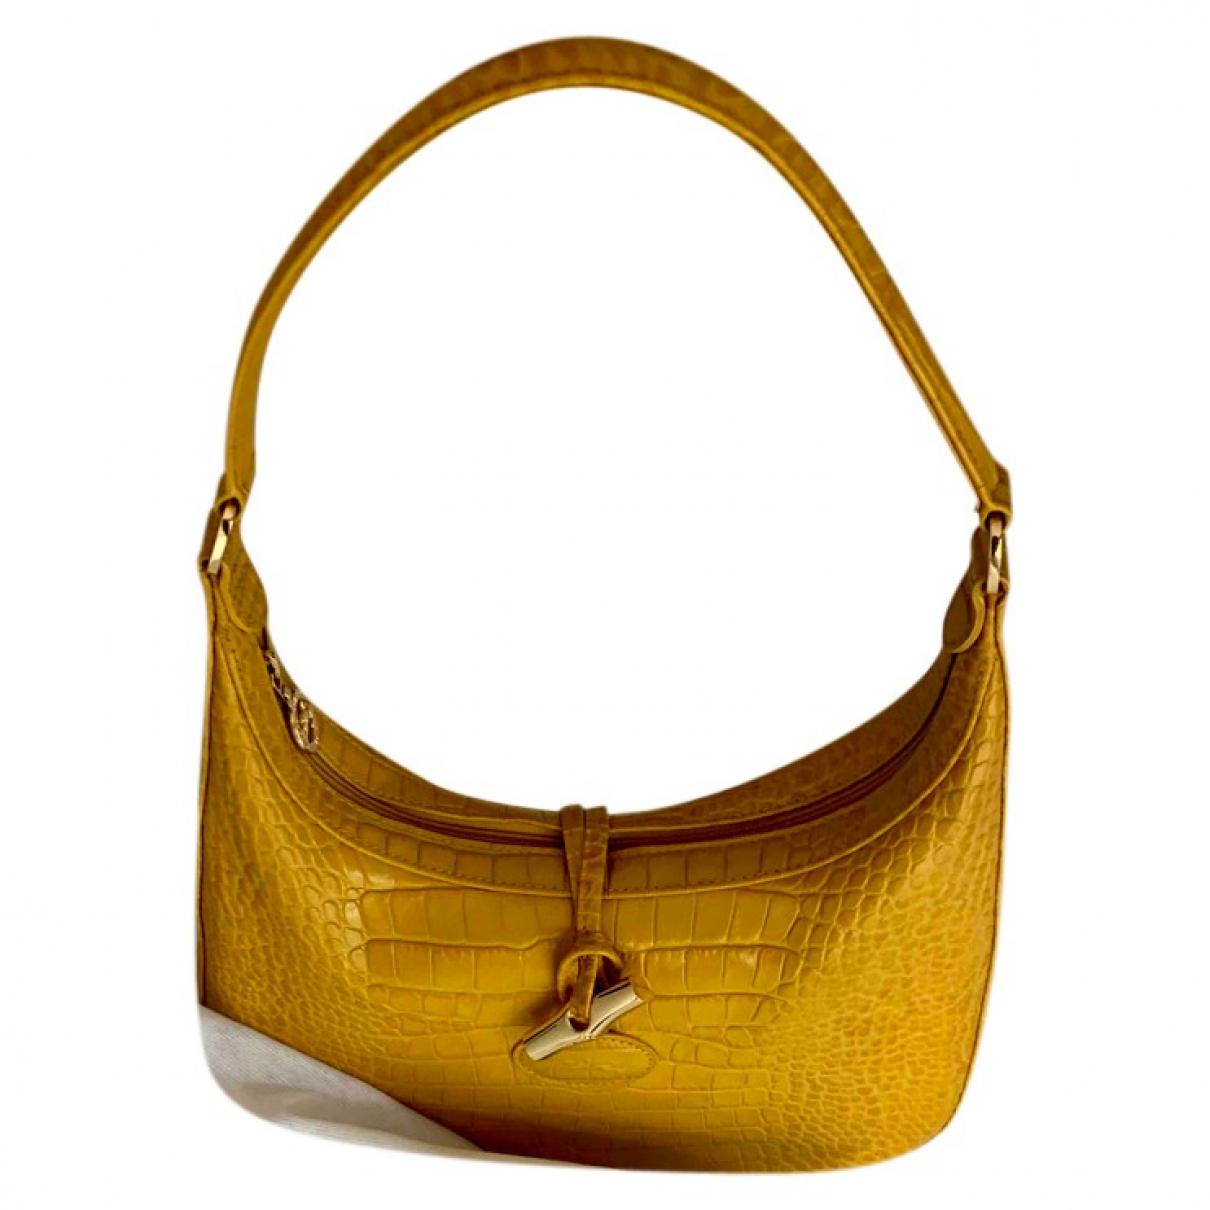 Longchamp N Yellow Leather handbag for Women N